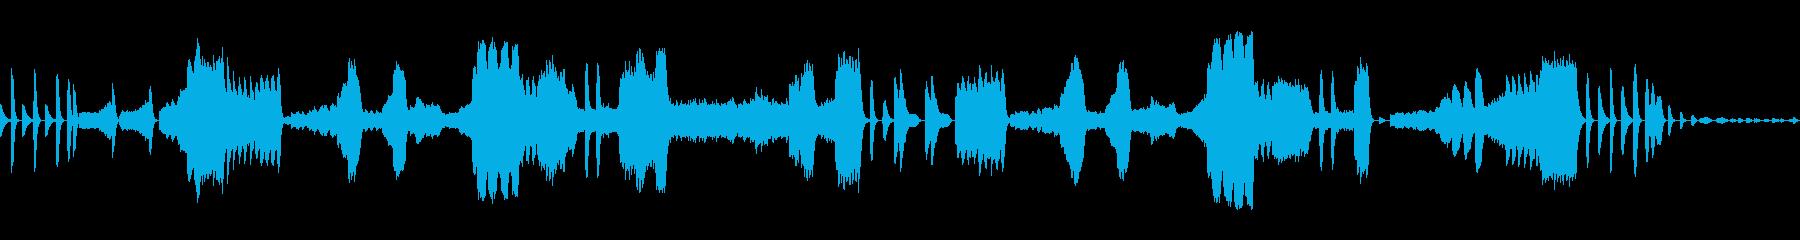 「BGMの宝庫2」-劇的コリオランよりの再生済みの波形